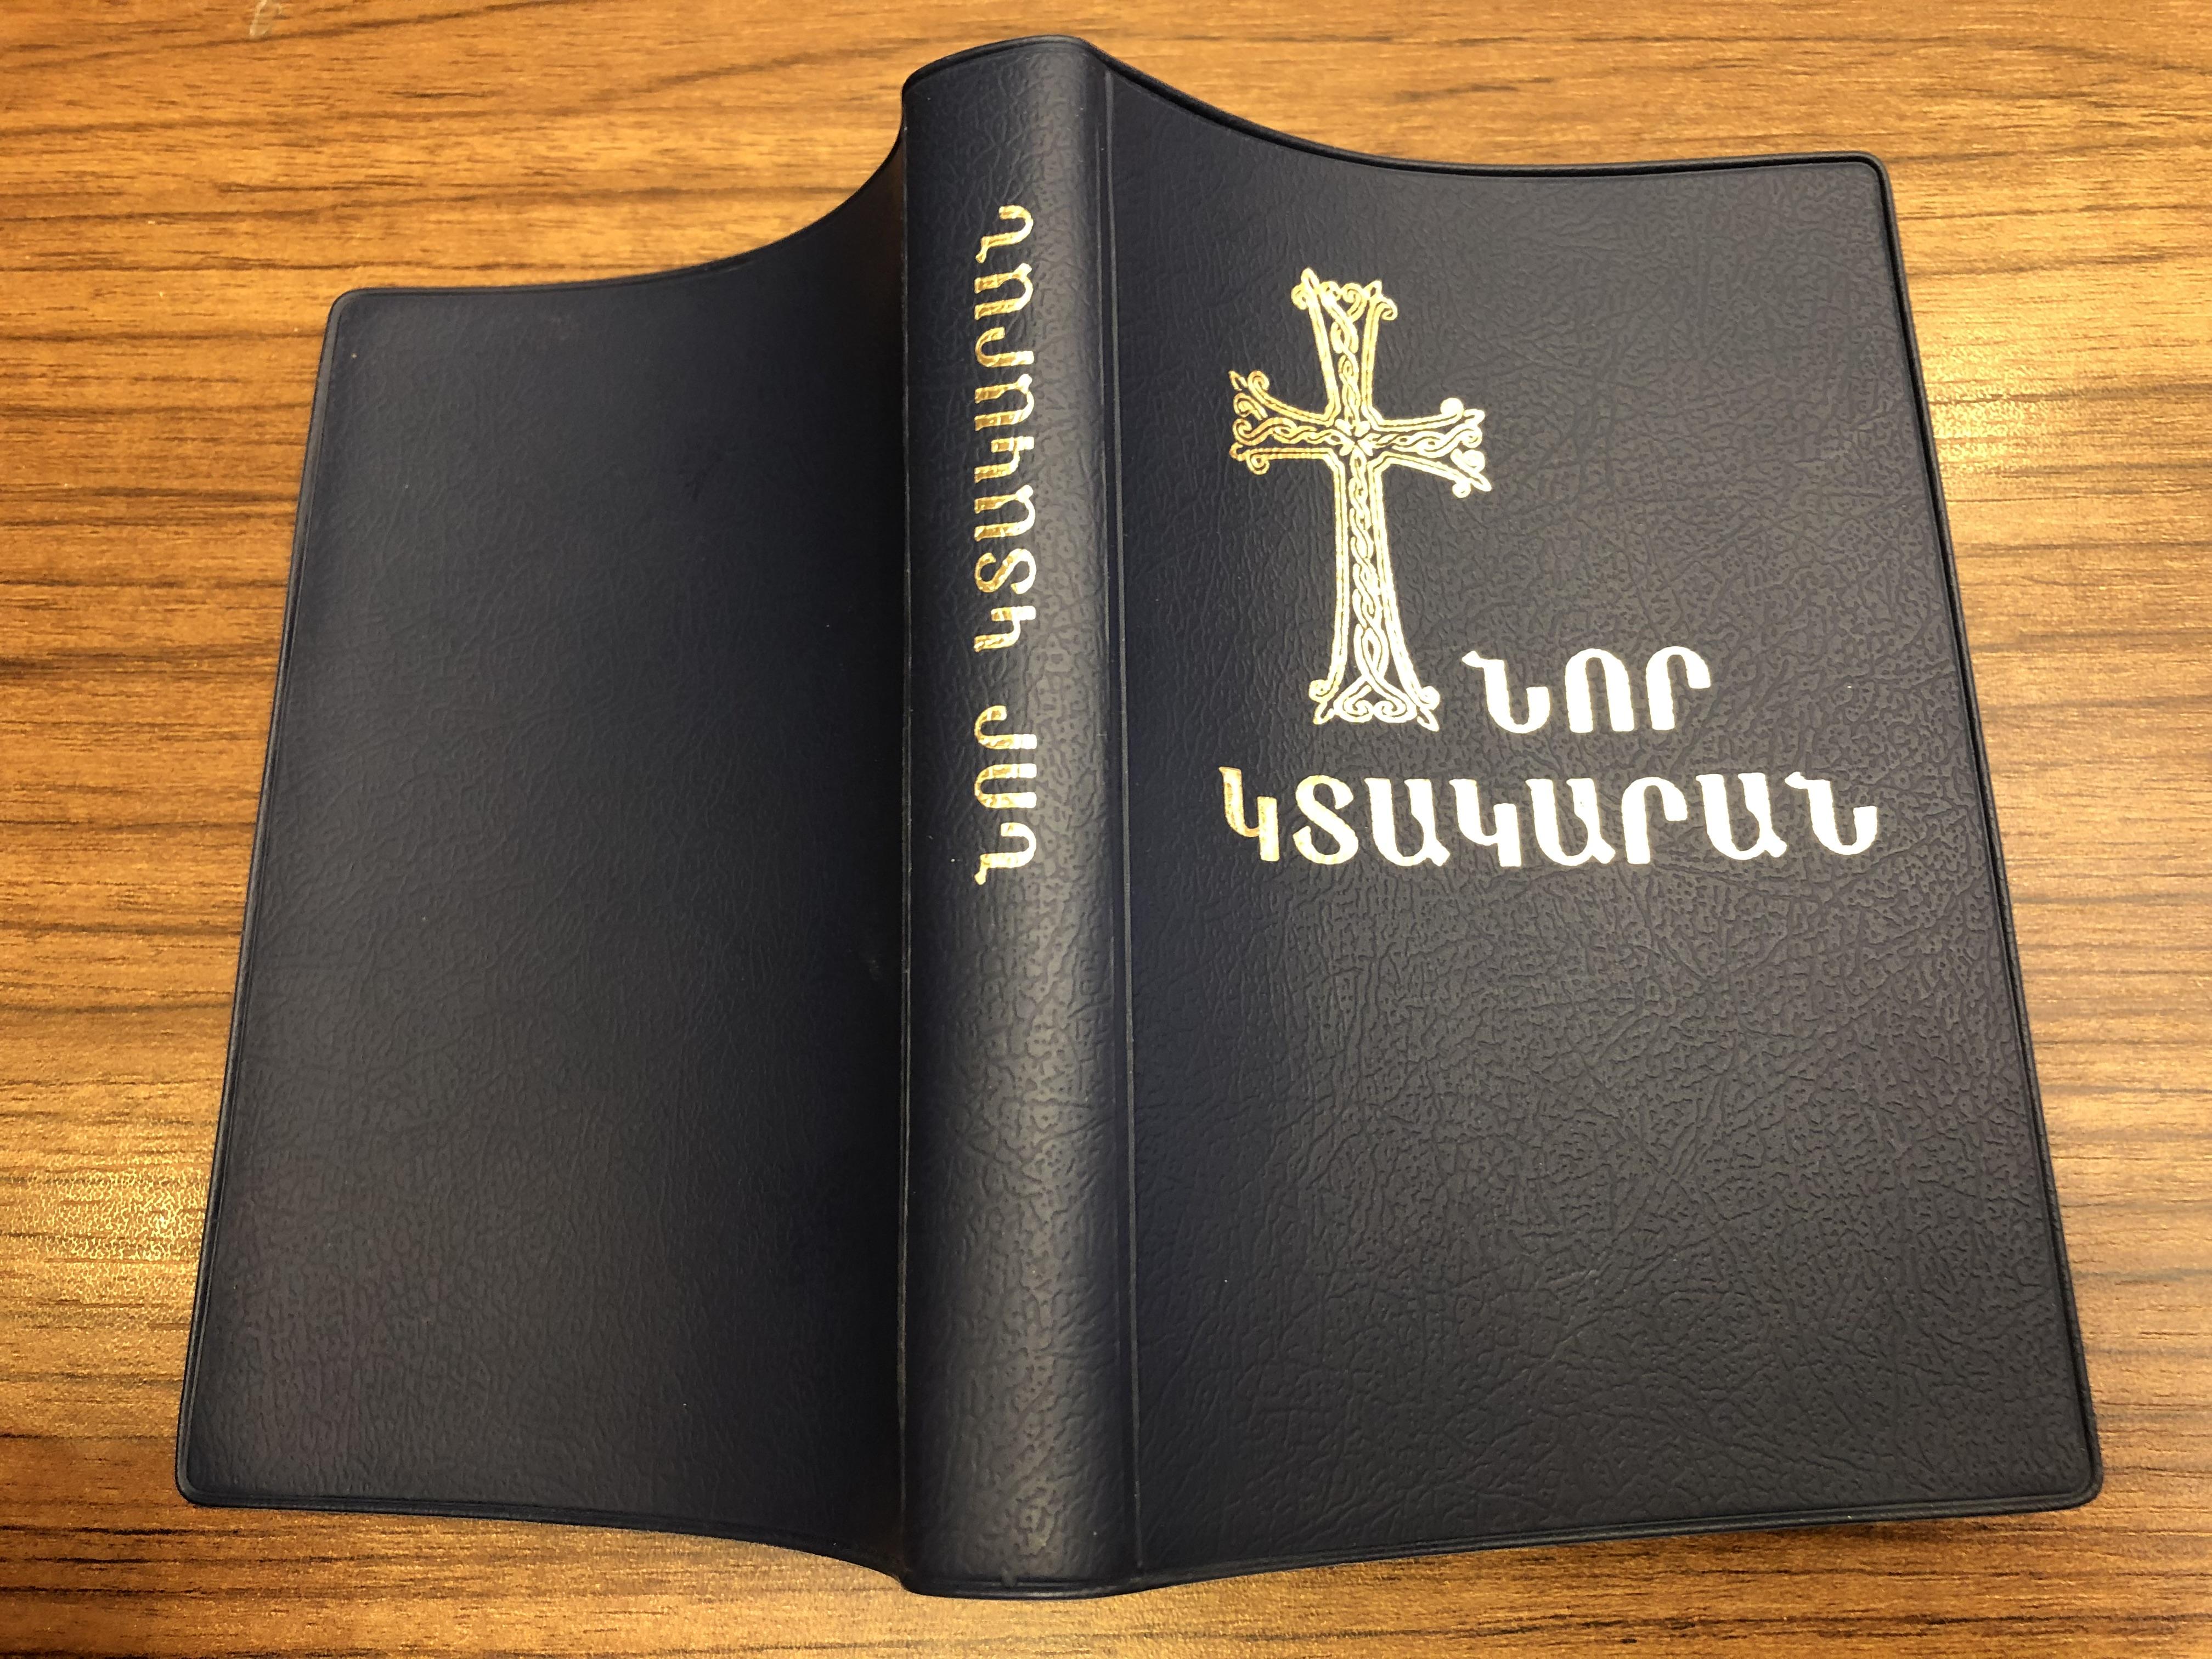 western-armenian-revised-new-testament-black-vinyl-bound-ubs-eps-1997-compact-size-11-.jpg